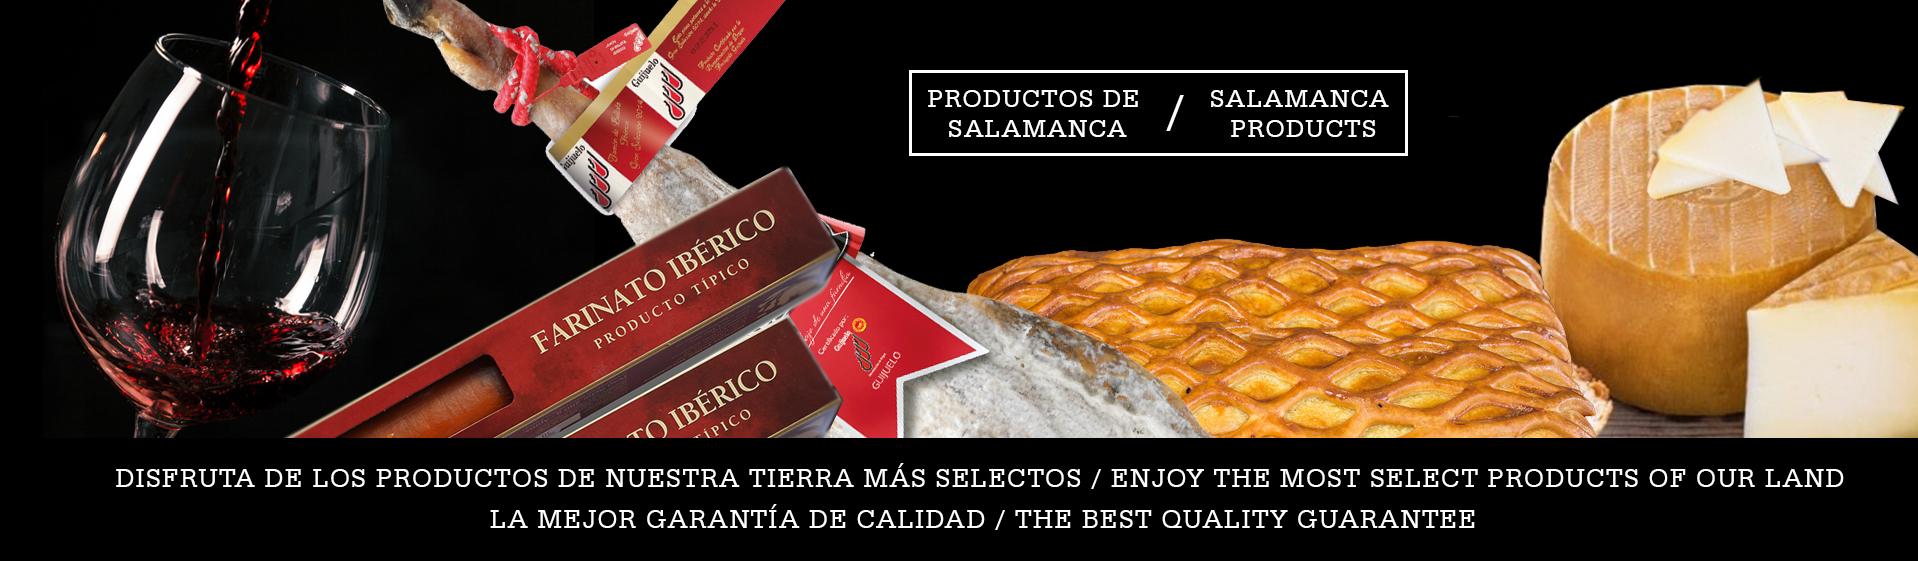 Productos de Salamanca